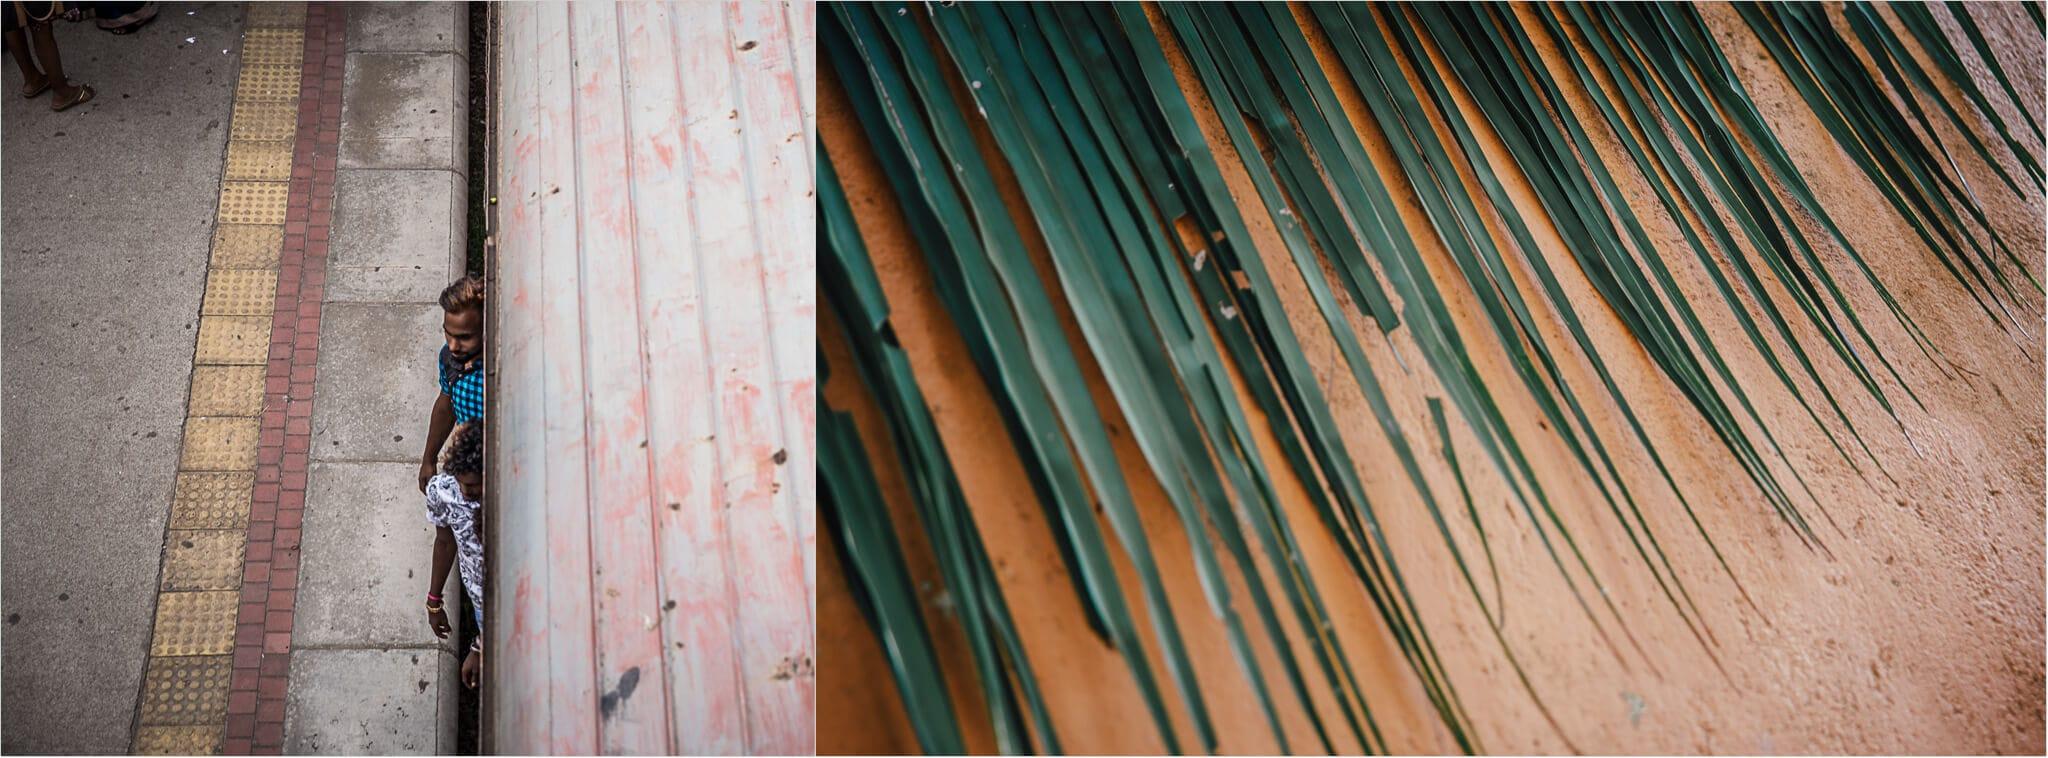 Palmenblatt und Zug in Sri Lanka